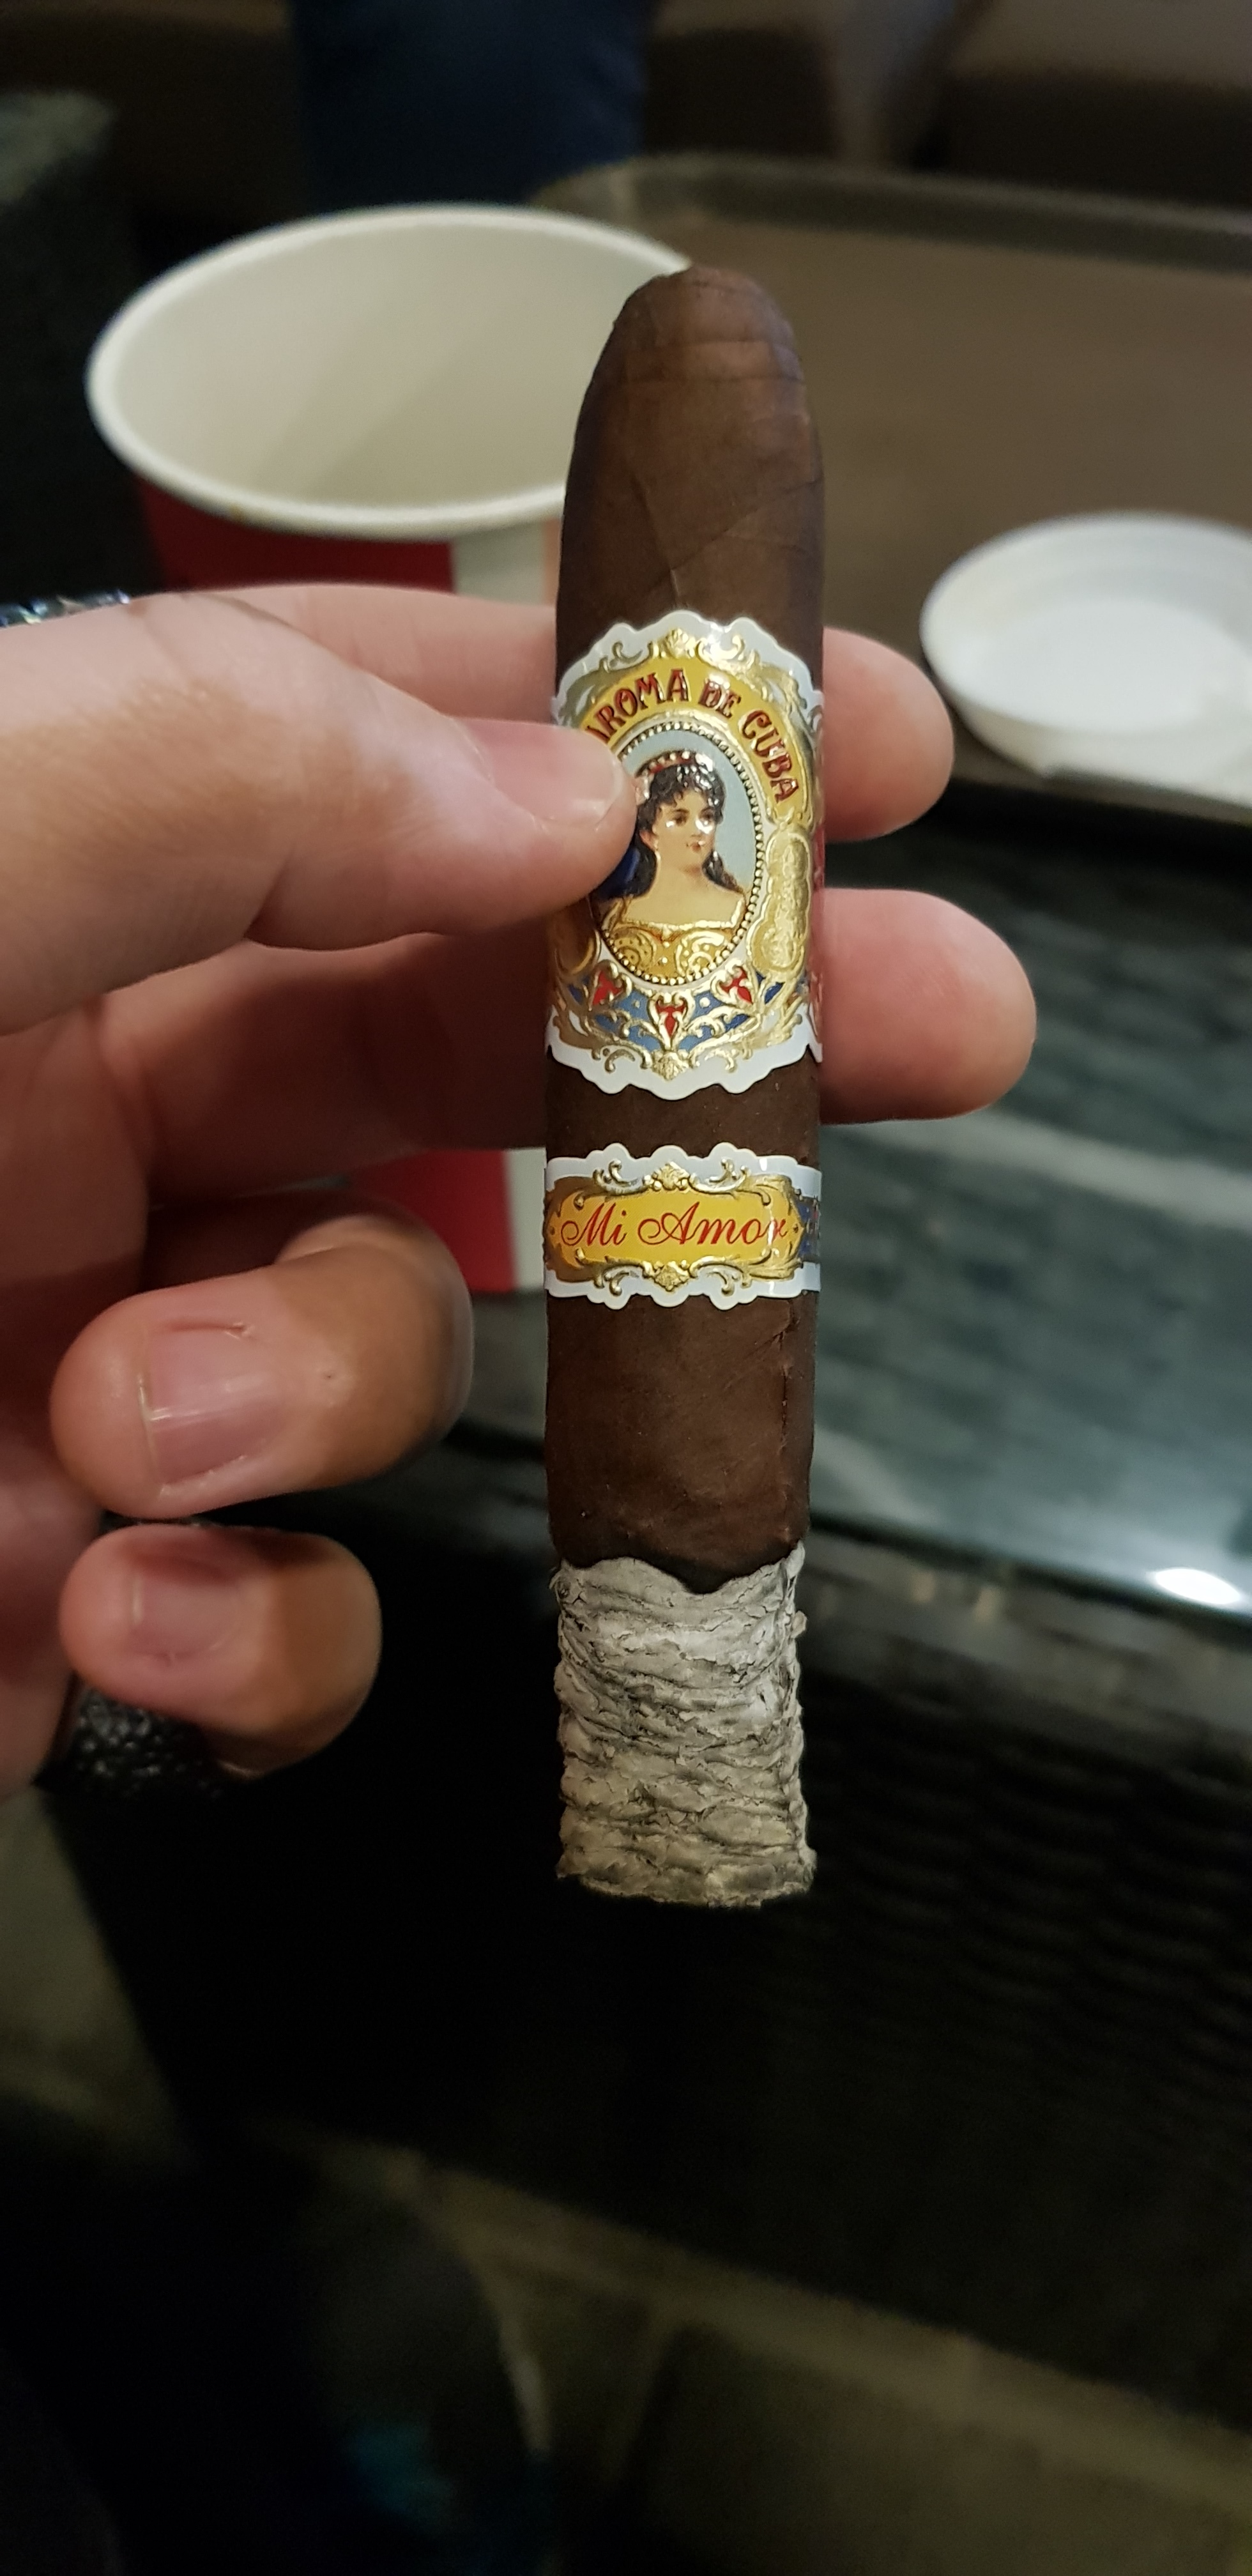 La Aroma de Cuba Mi Amor Belicoso 5